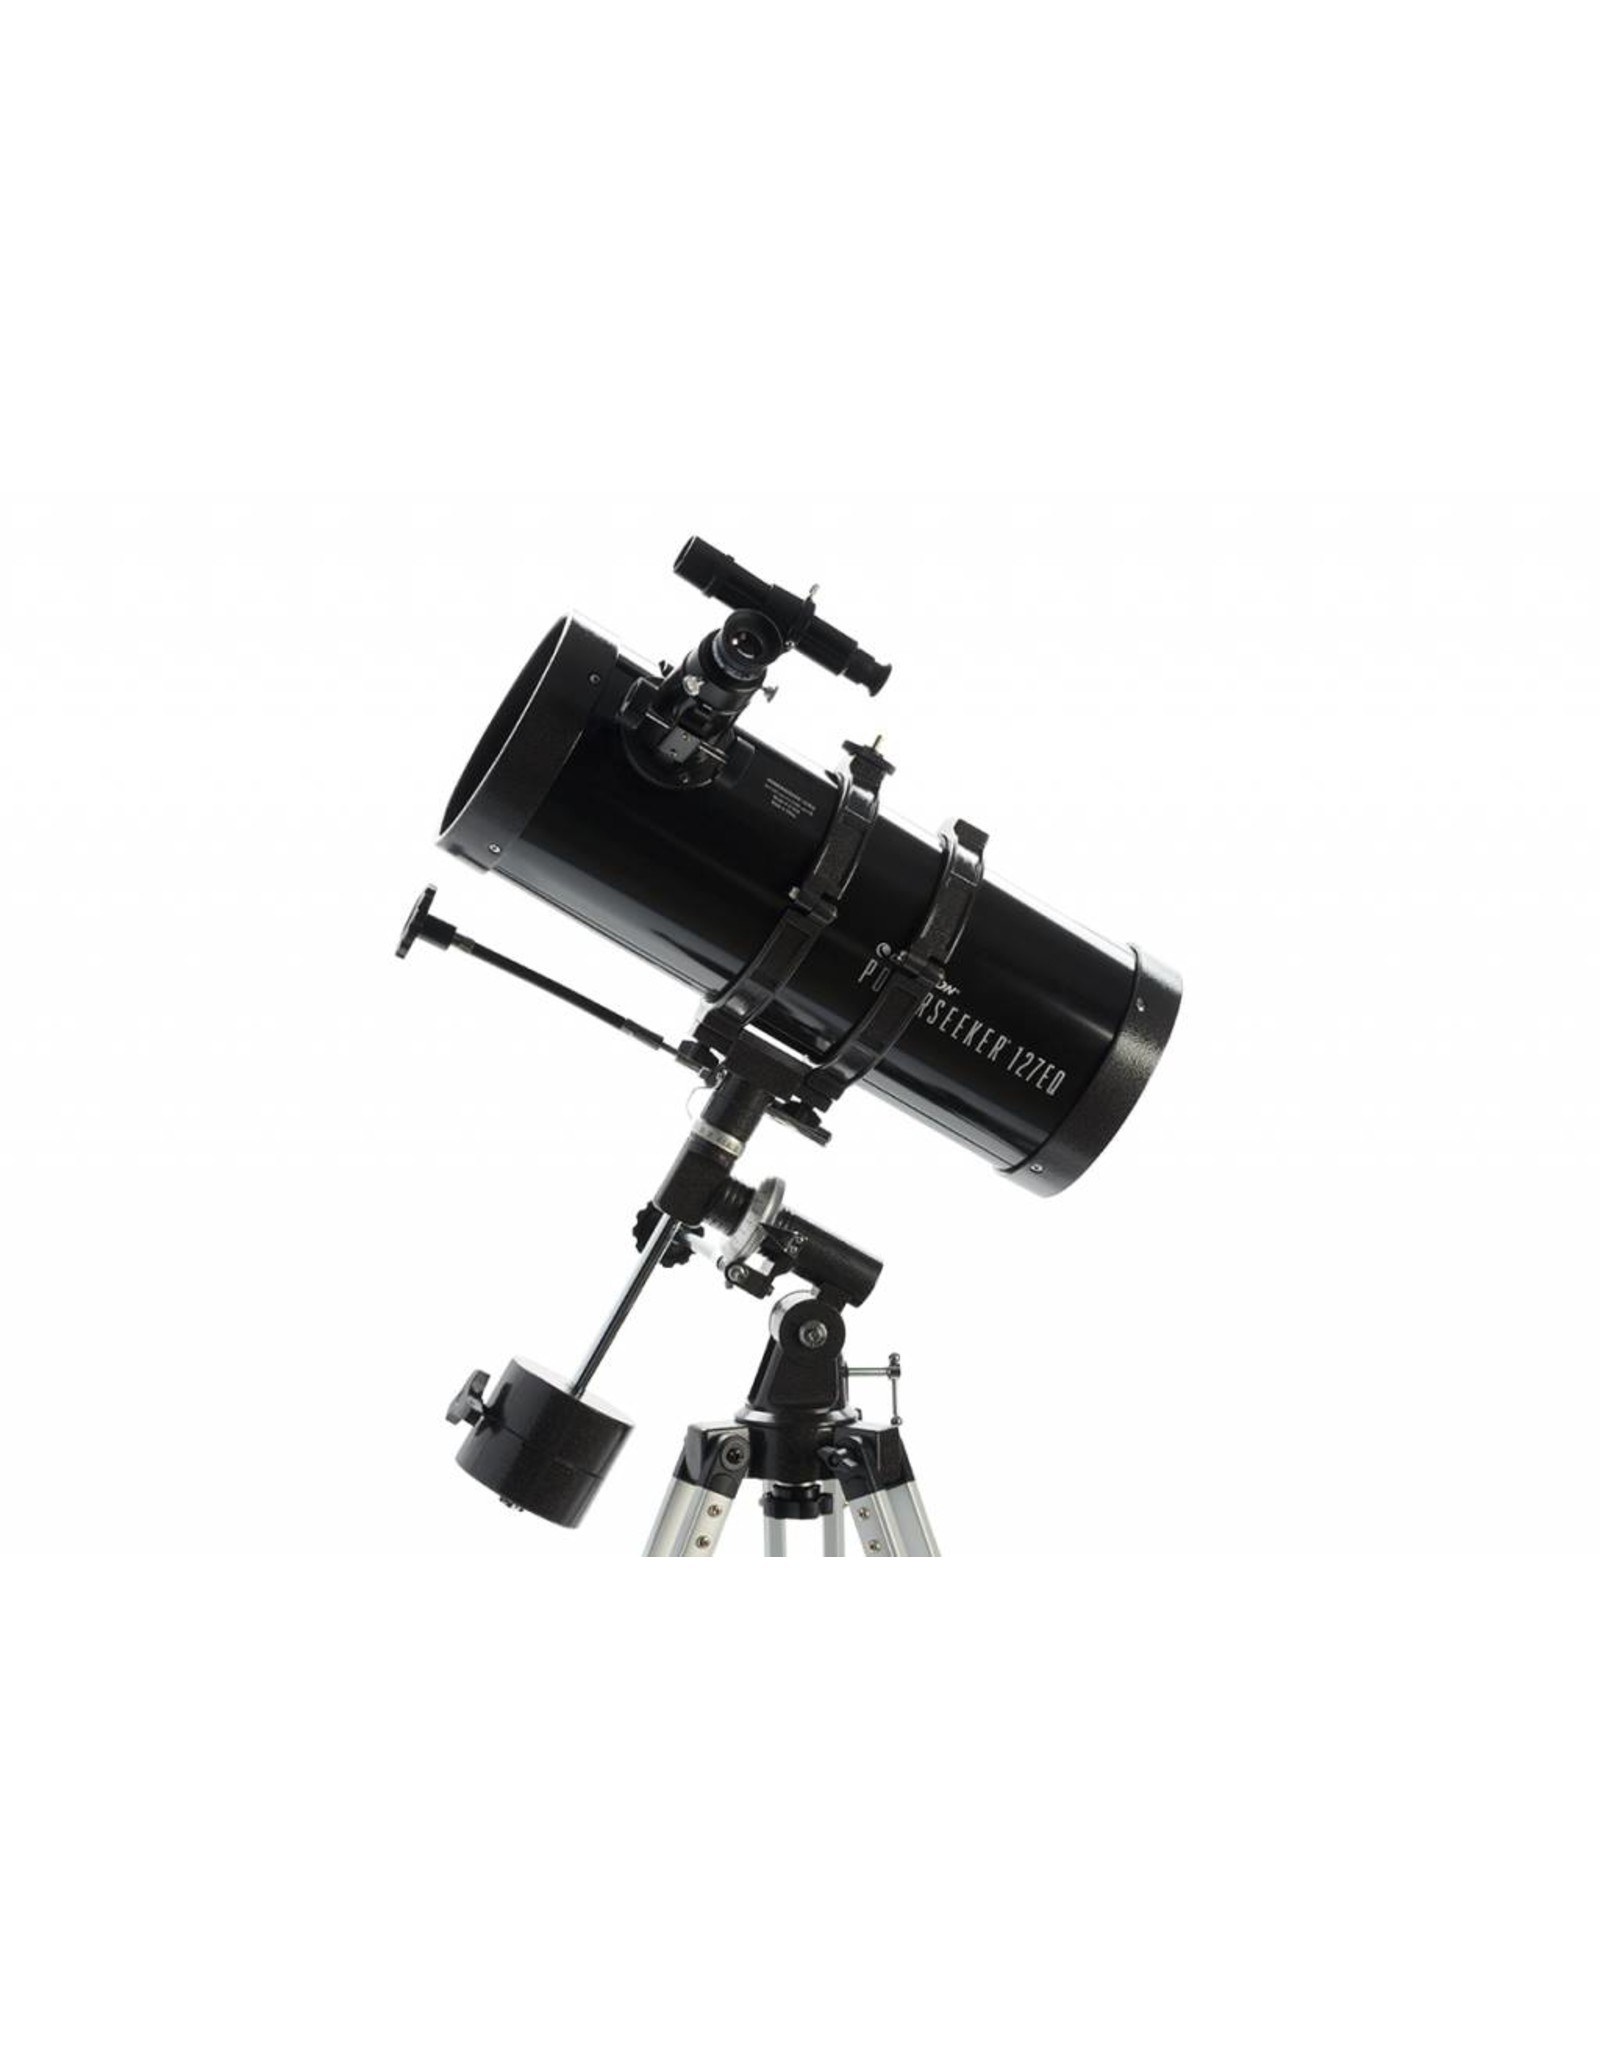 Celestron 127EQ Powerseeker Telescope Review [Worth it?] - DopeGuides